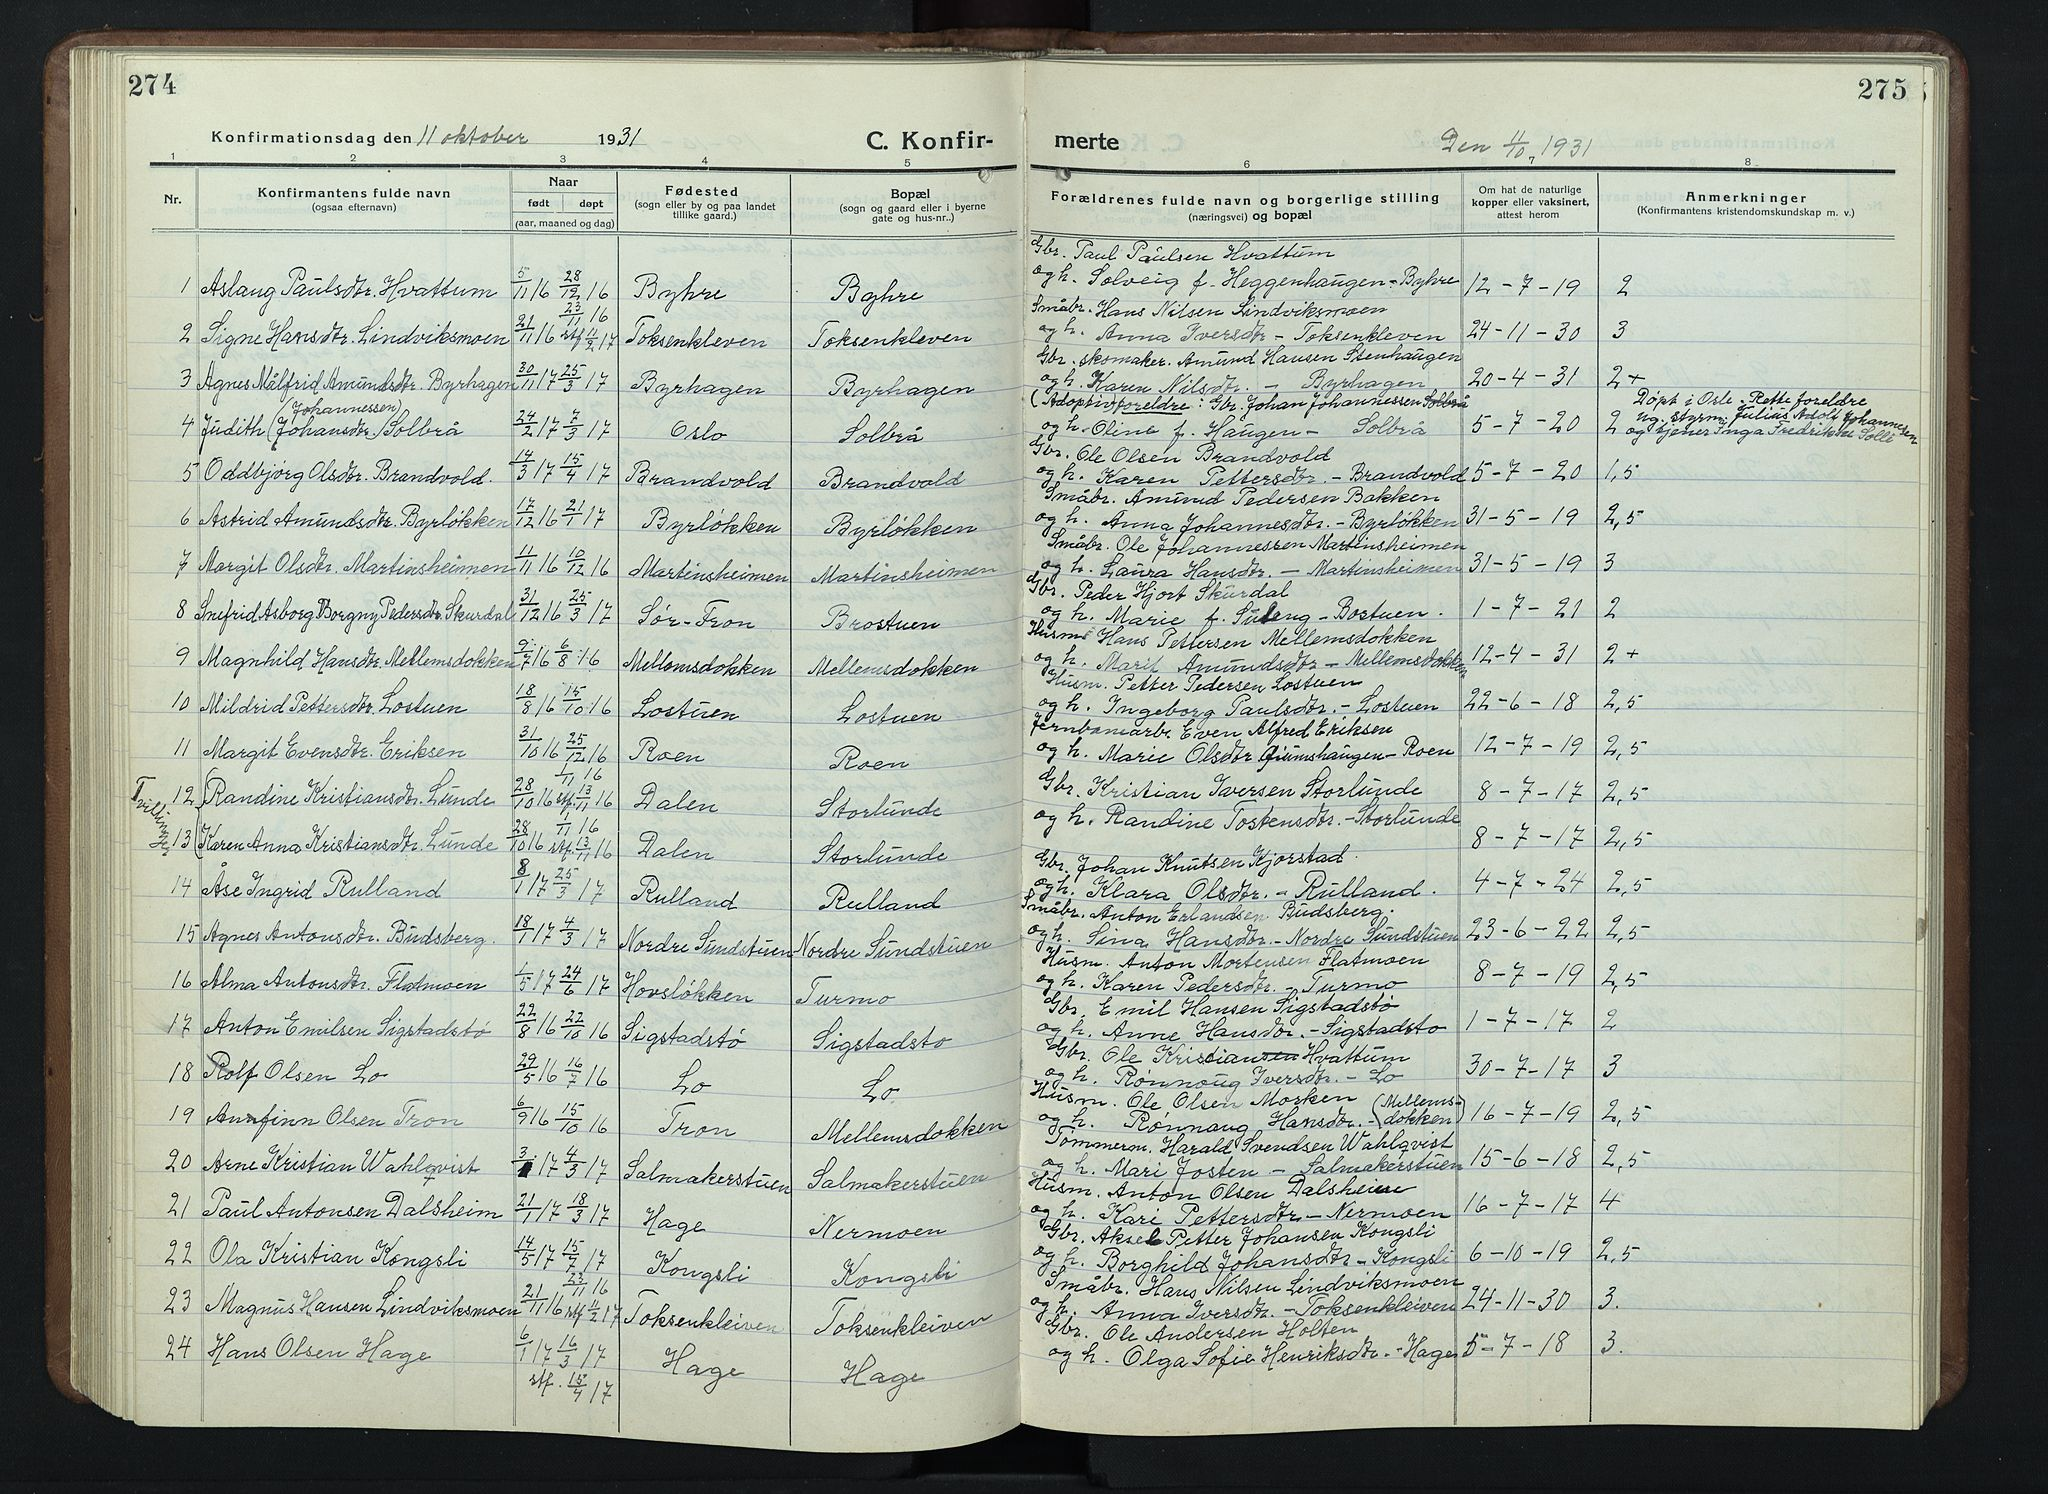 SAH, Nord-Fron prestekontor, Klokkerbok nr. 7, 1915-1946, s. 274-275